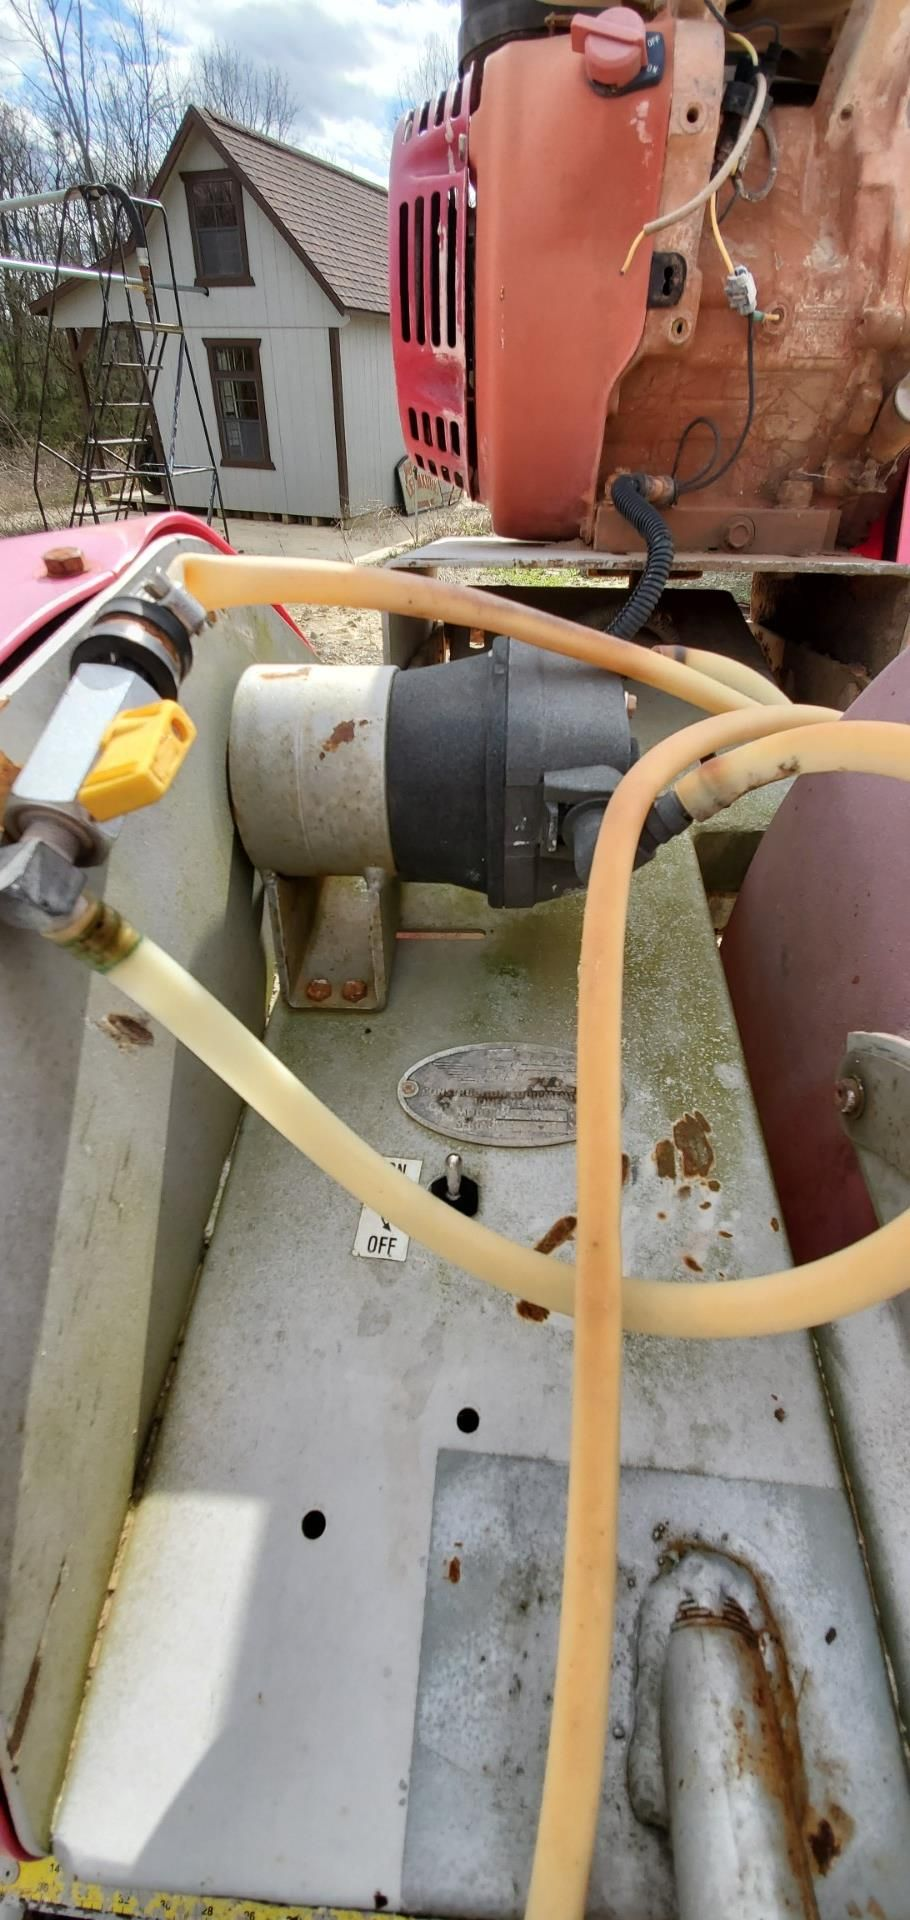 Stone Model MS2 20 in Masonry Block Saw, 13 HP Honda Gas Engine - Image 7 of 8